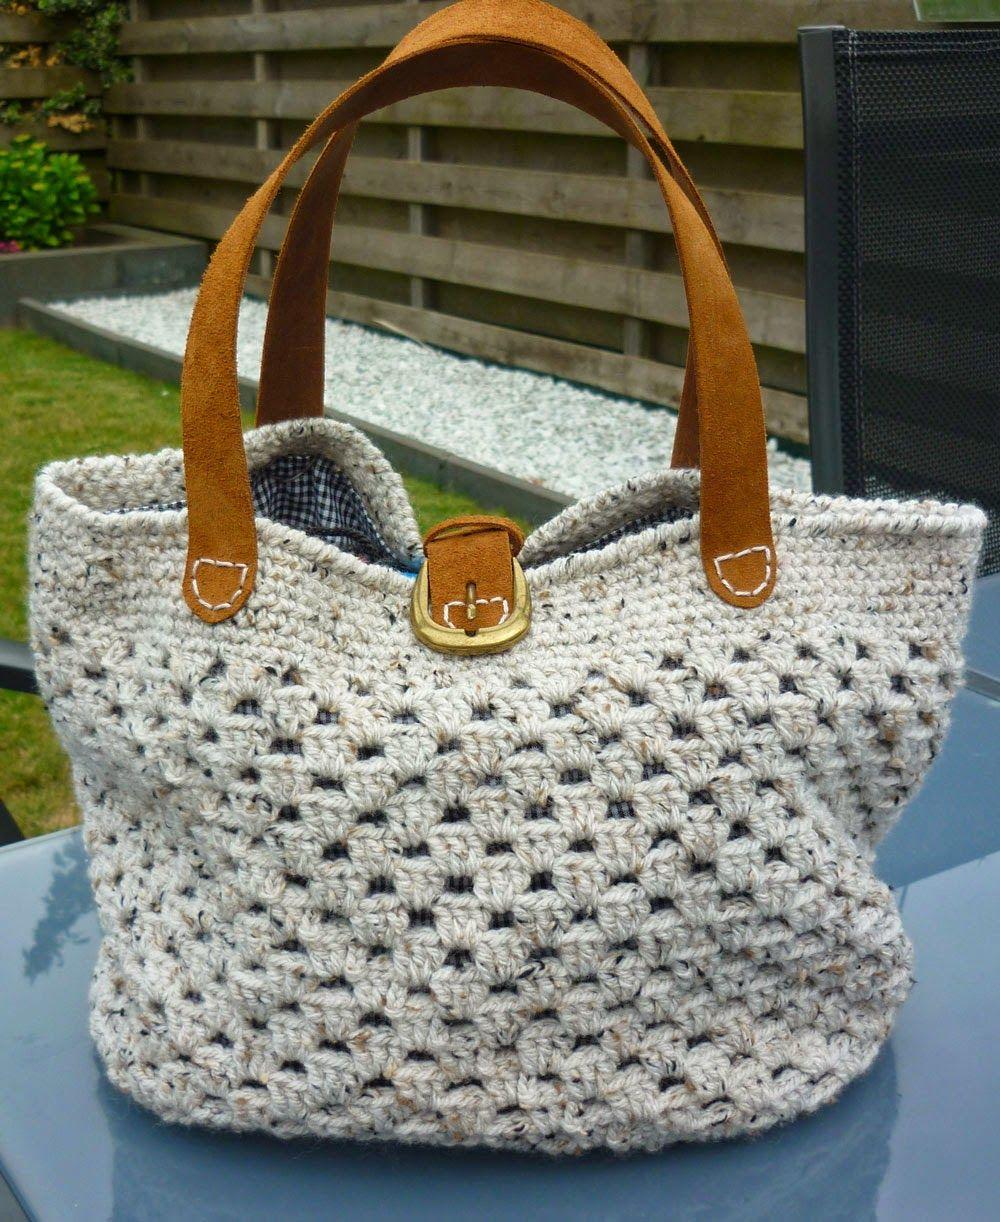 Granny stitch purse with leather handles. | tassen | Pinterest ...